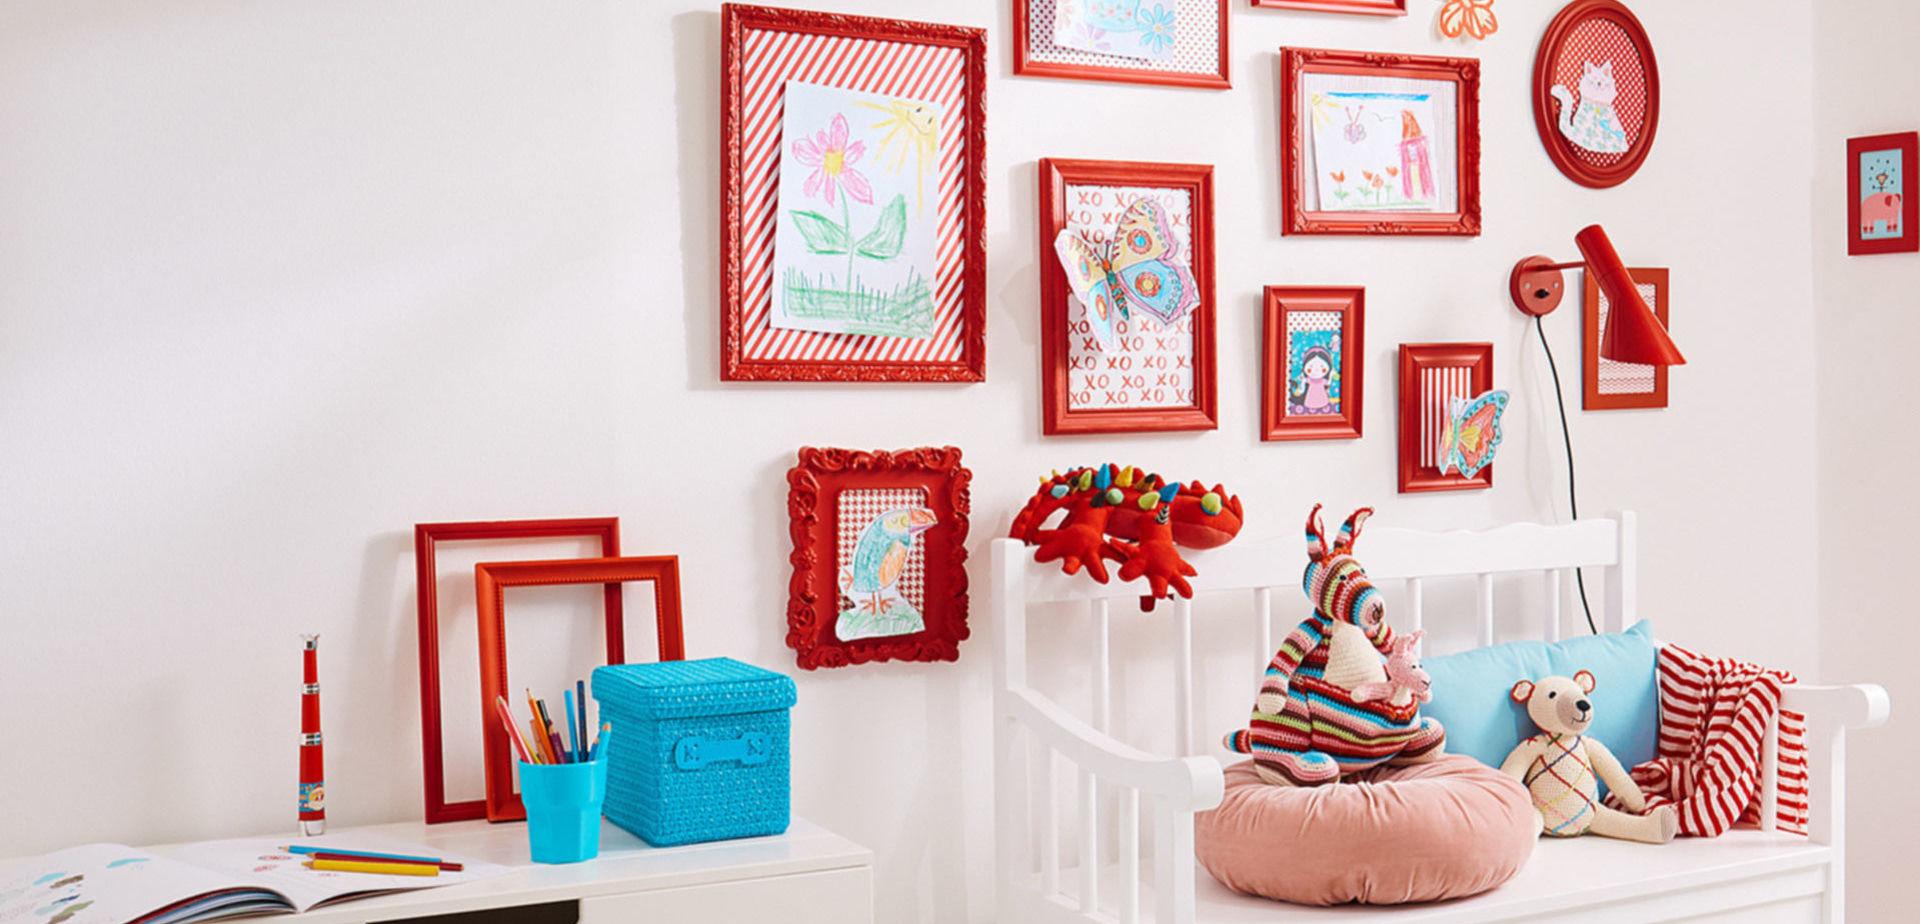 Wanddecoratie Babykamer Boom.Mdf Wanddecoratie Babykamer Jdees Shopping Centre Feestartikelen